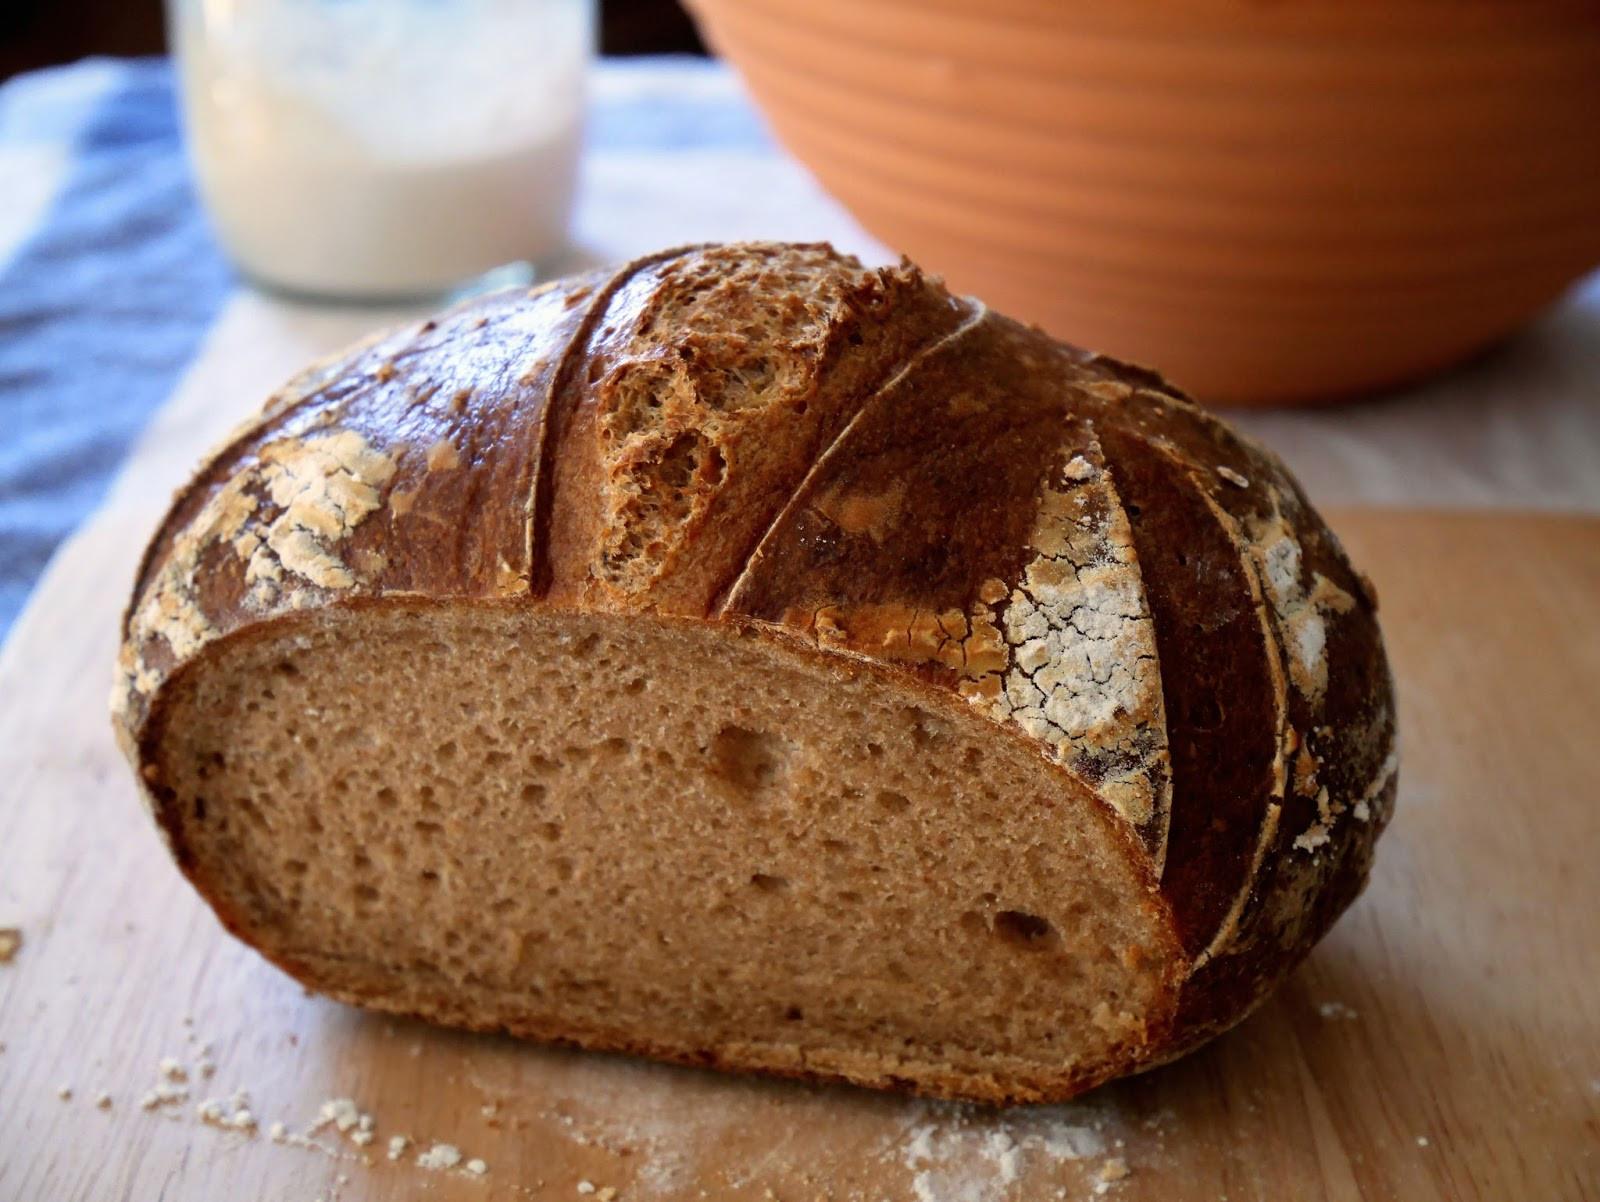 Gluten Free Sourdough Bread Recipe  Gluten Free Boulangerie The difference fermentation makes